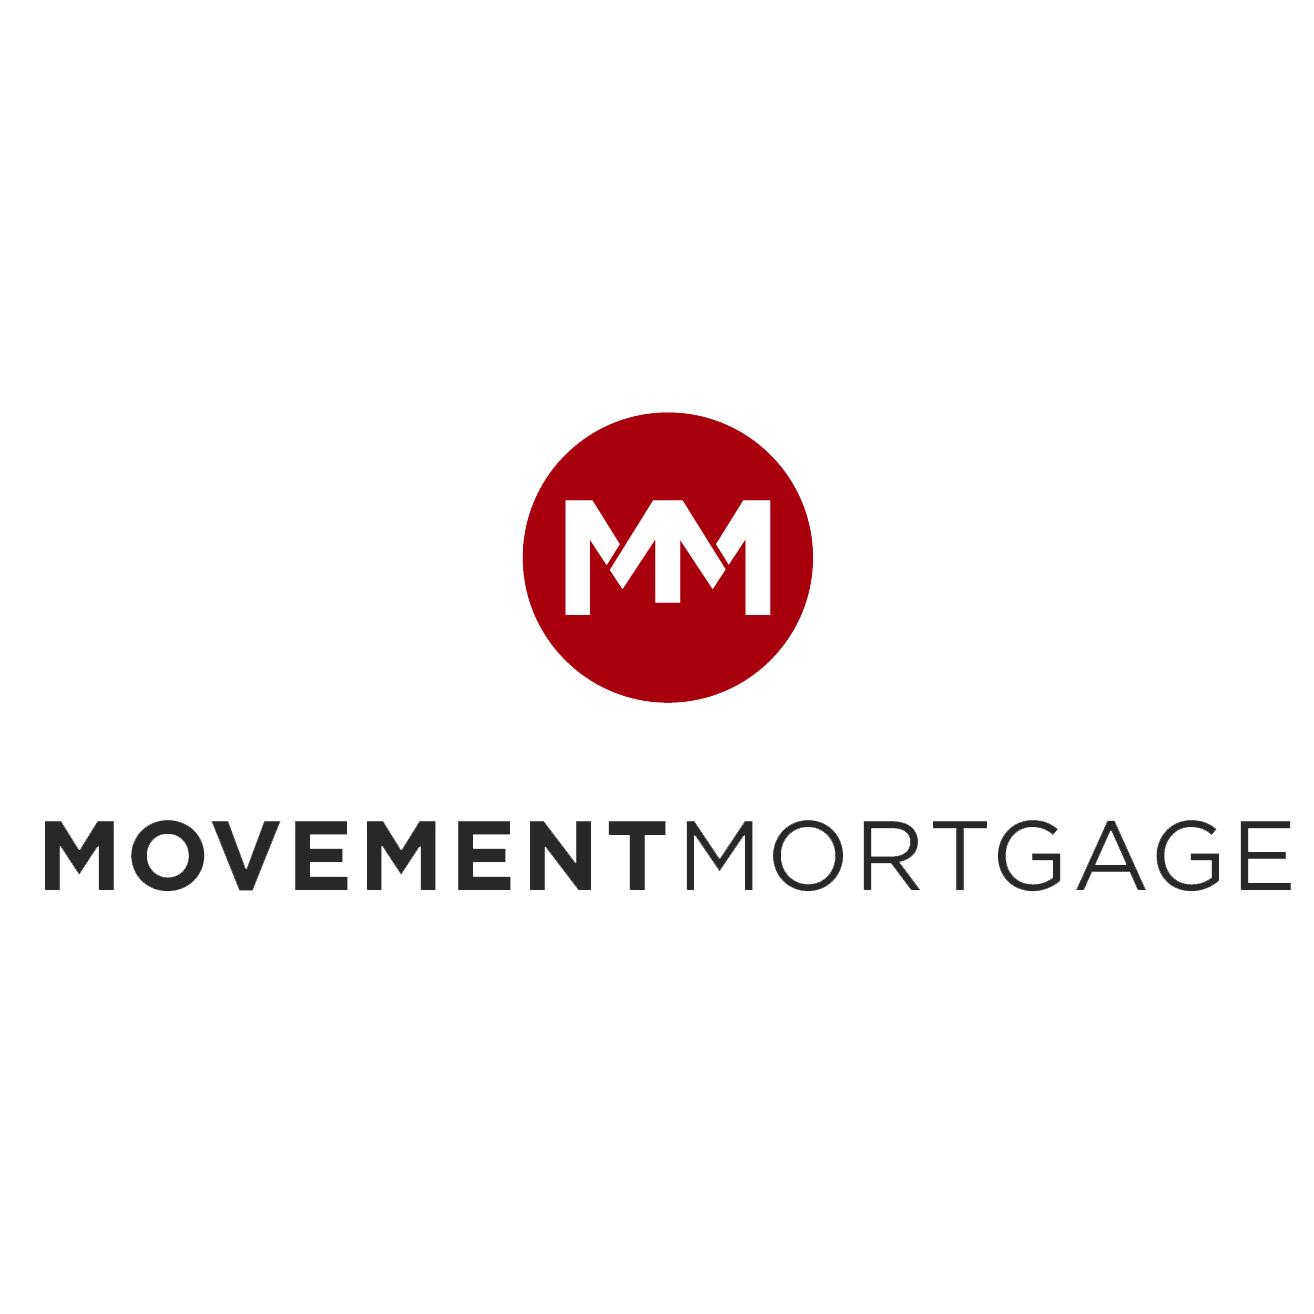 Robin Hood - Movement Mortgage